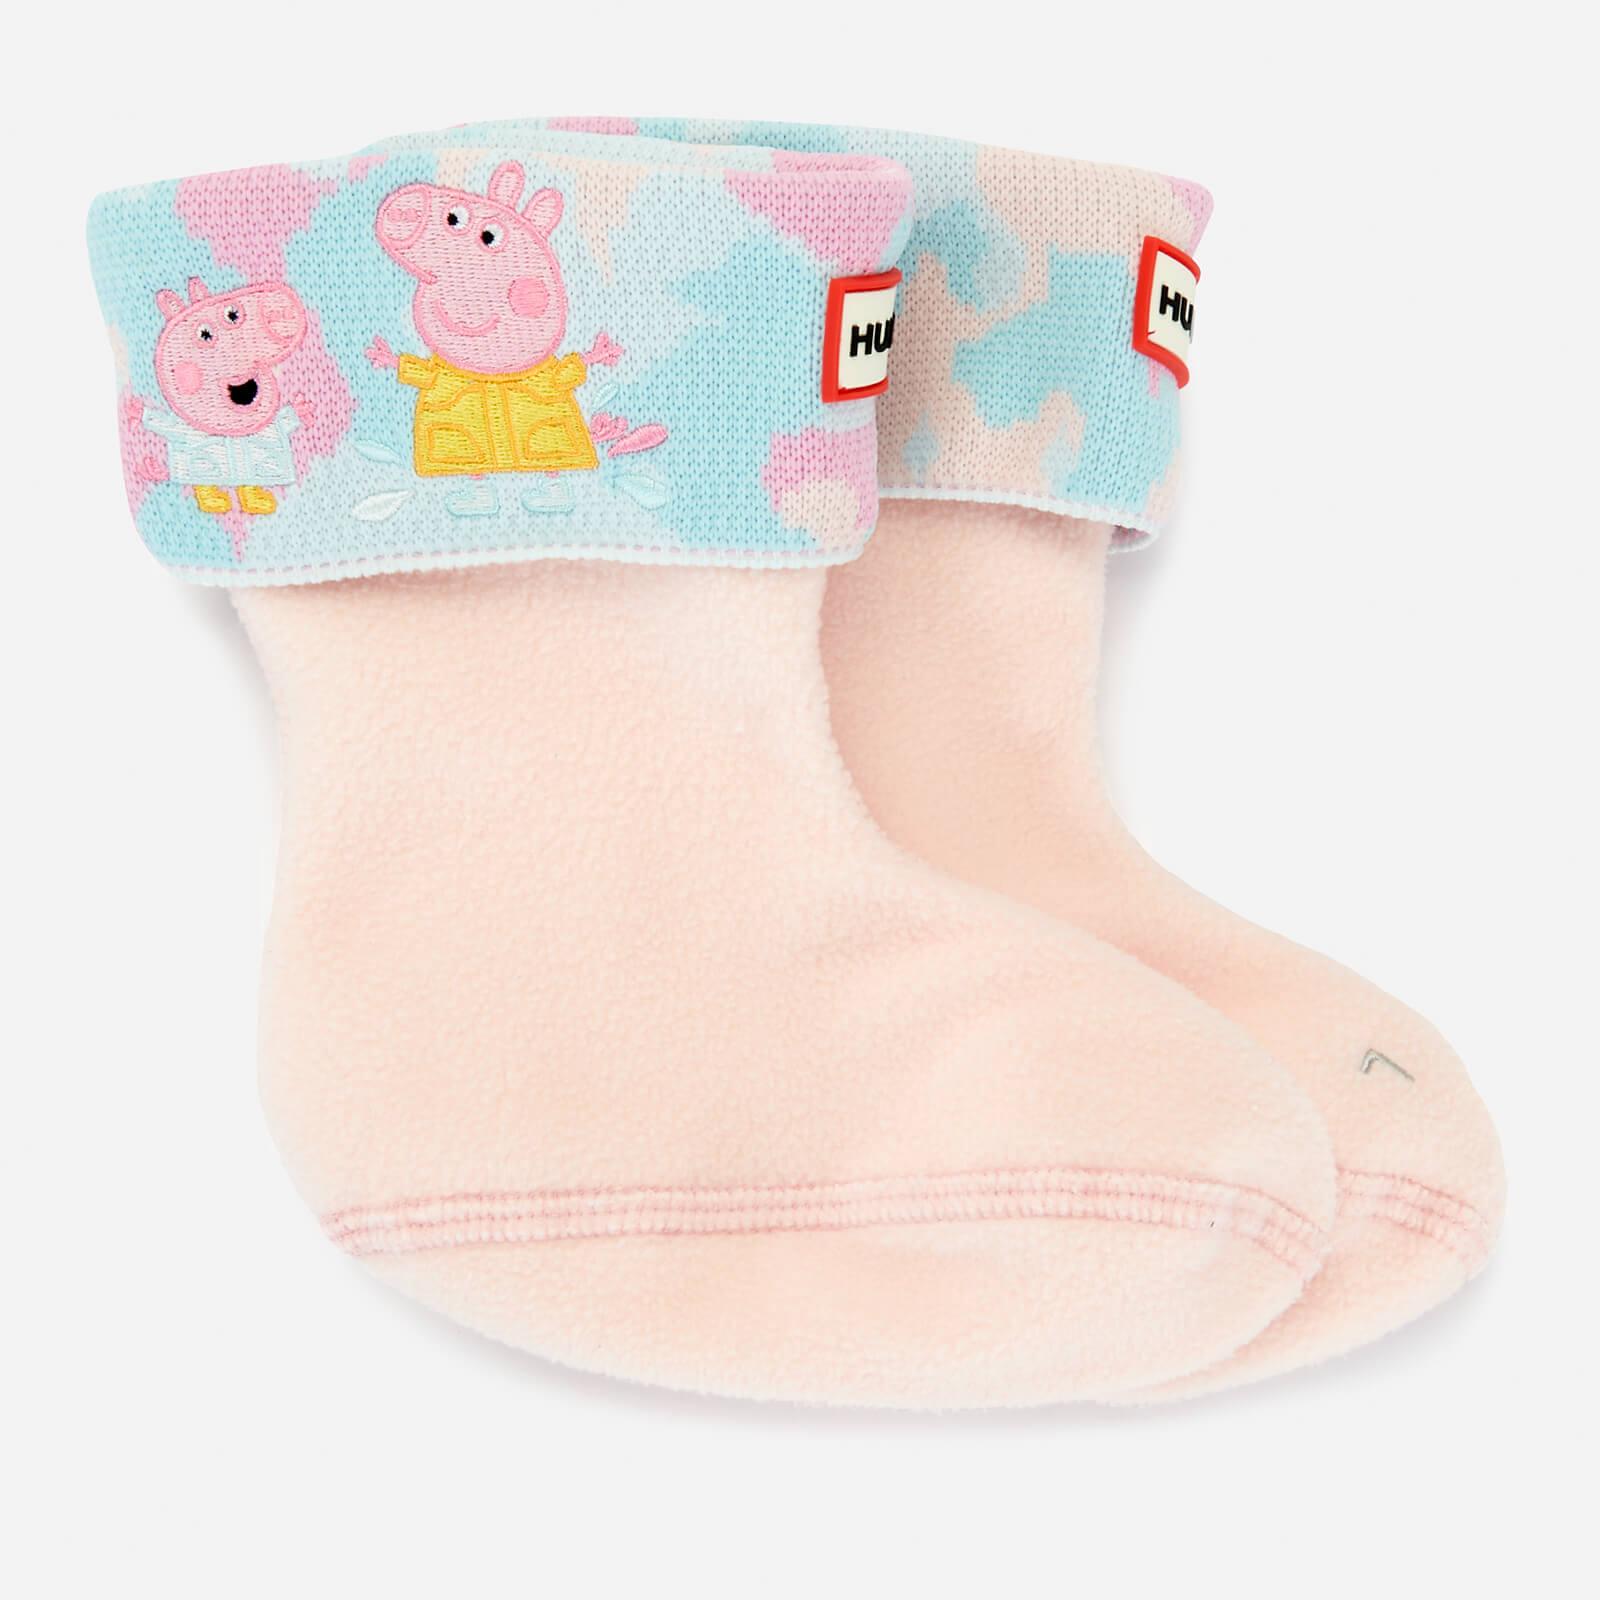 Hunter X Peppa Pig Kids' Boot Sock - Dragonfly Blue - UK 4-6 Kids